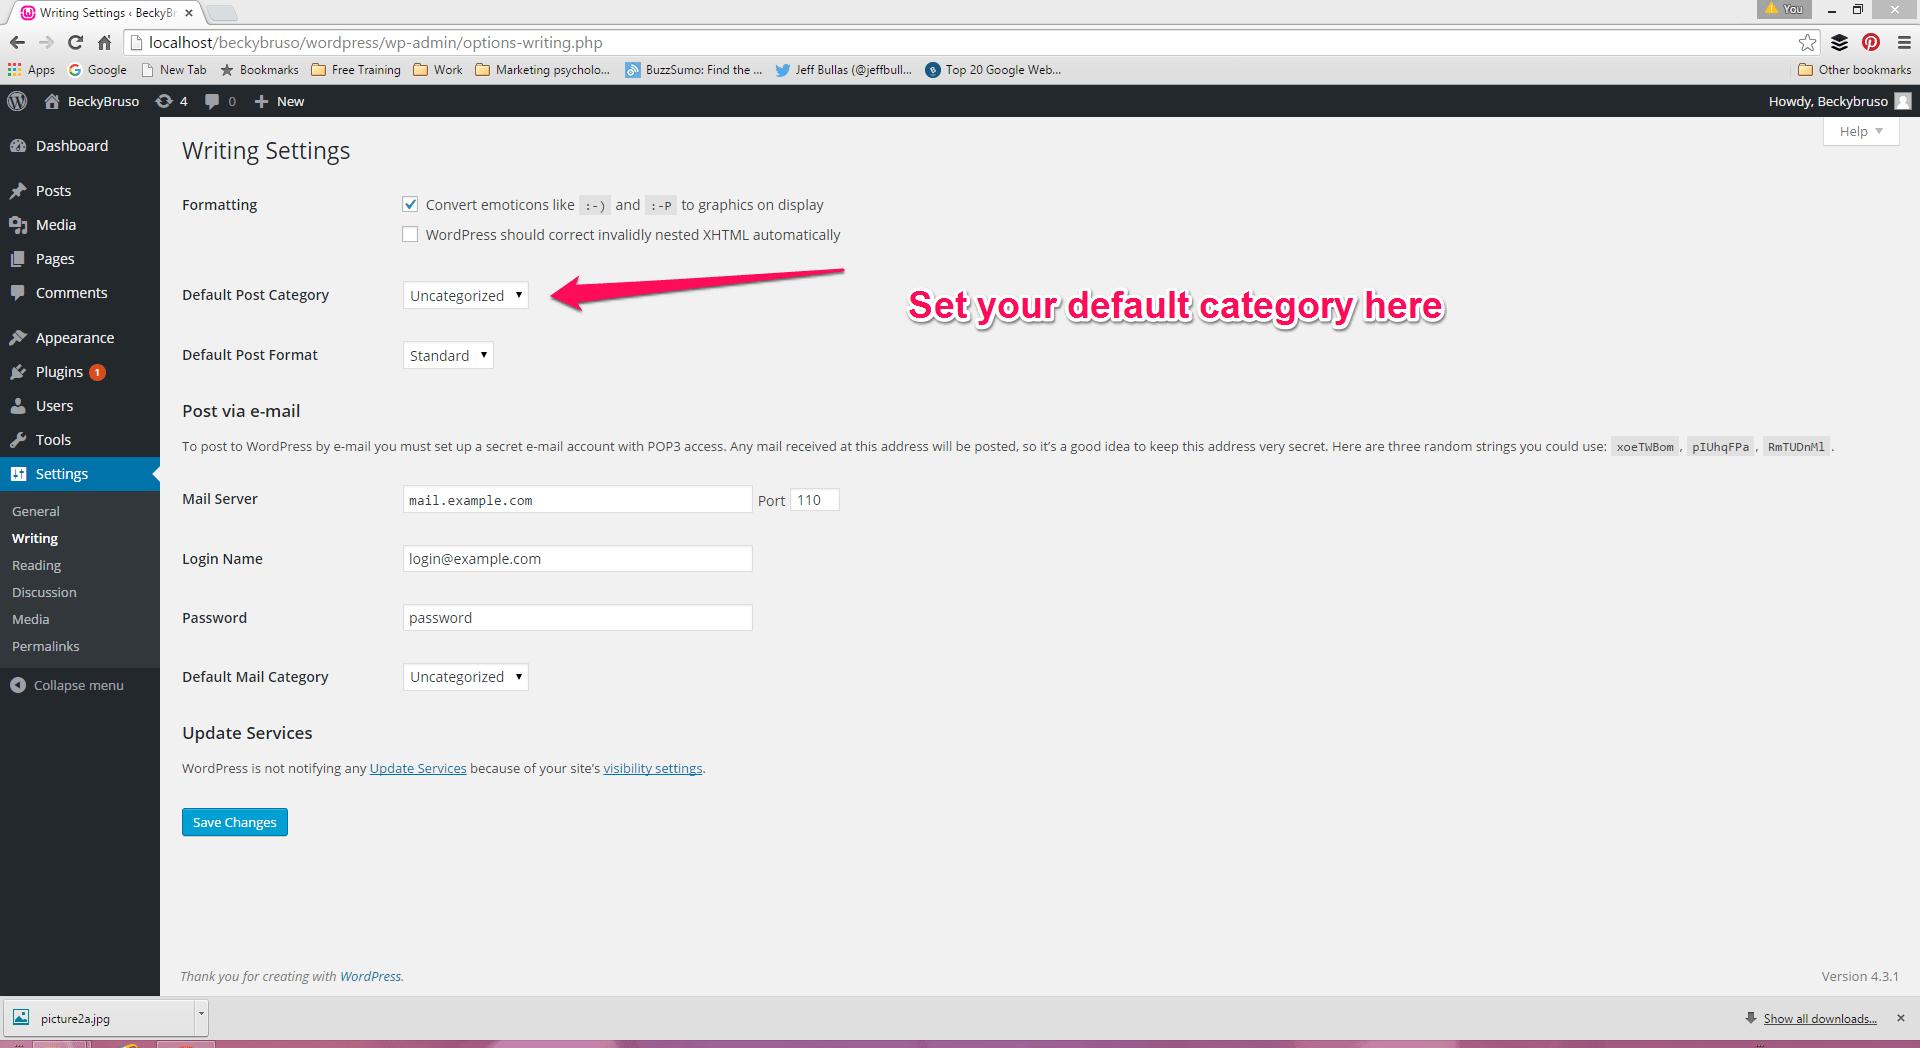 Wordpress - Set up a default post category